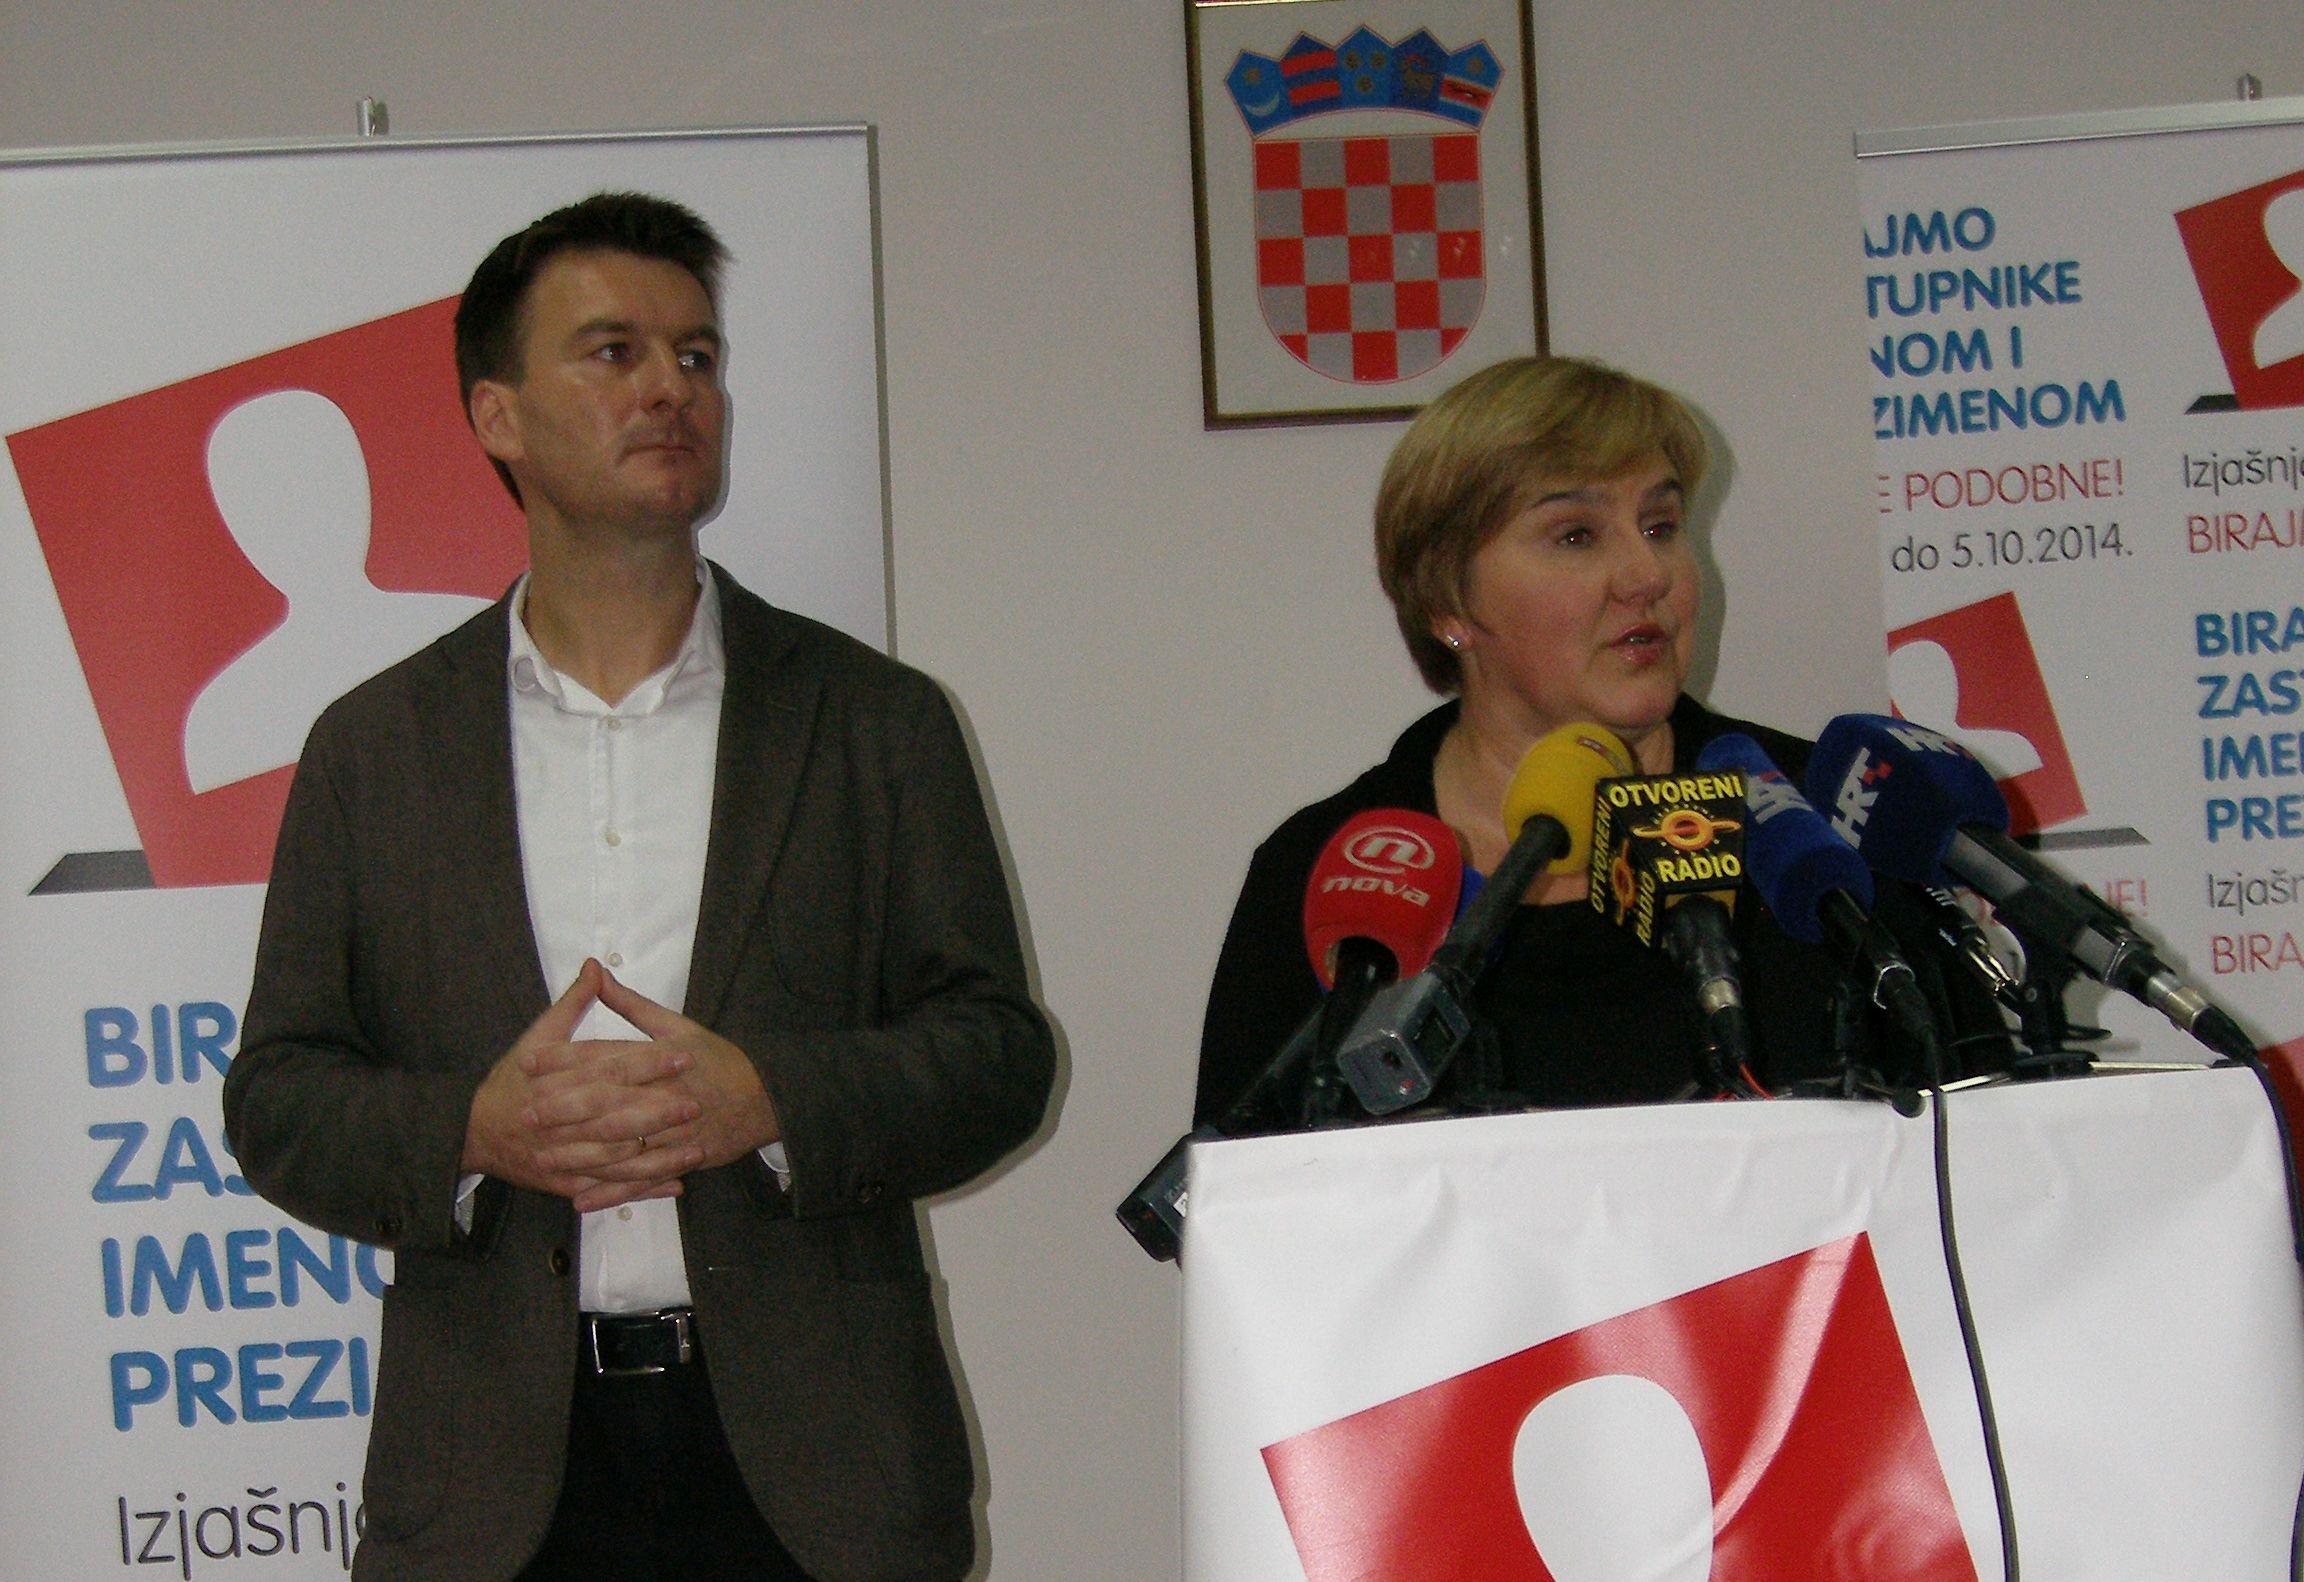 PNUSKOK pozvao članove organizacijskog odbora građanske inicijative U ime obitelji na razgovor